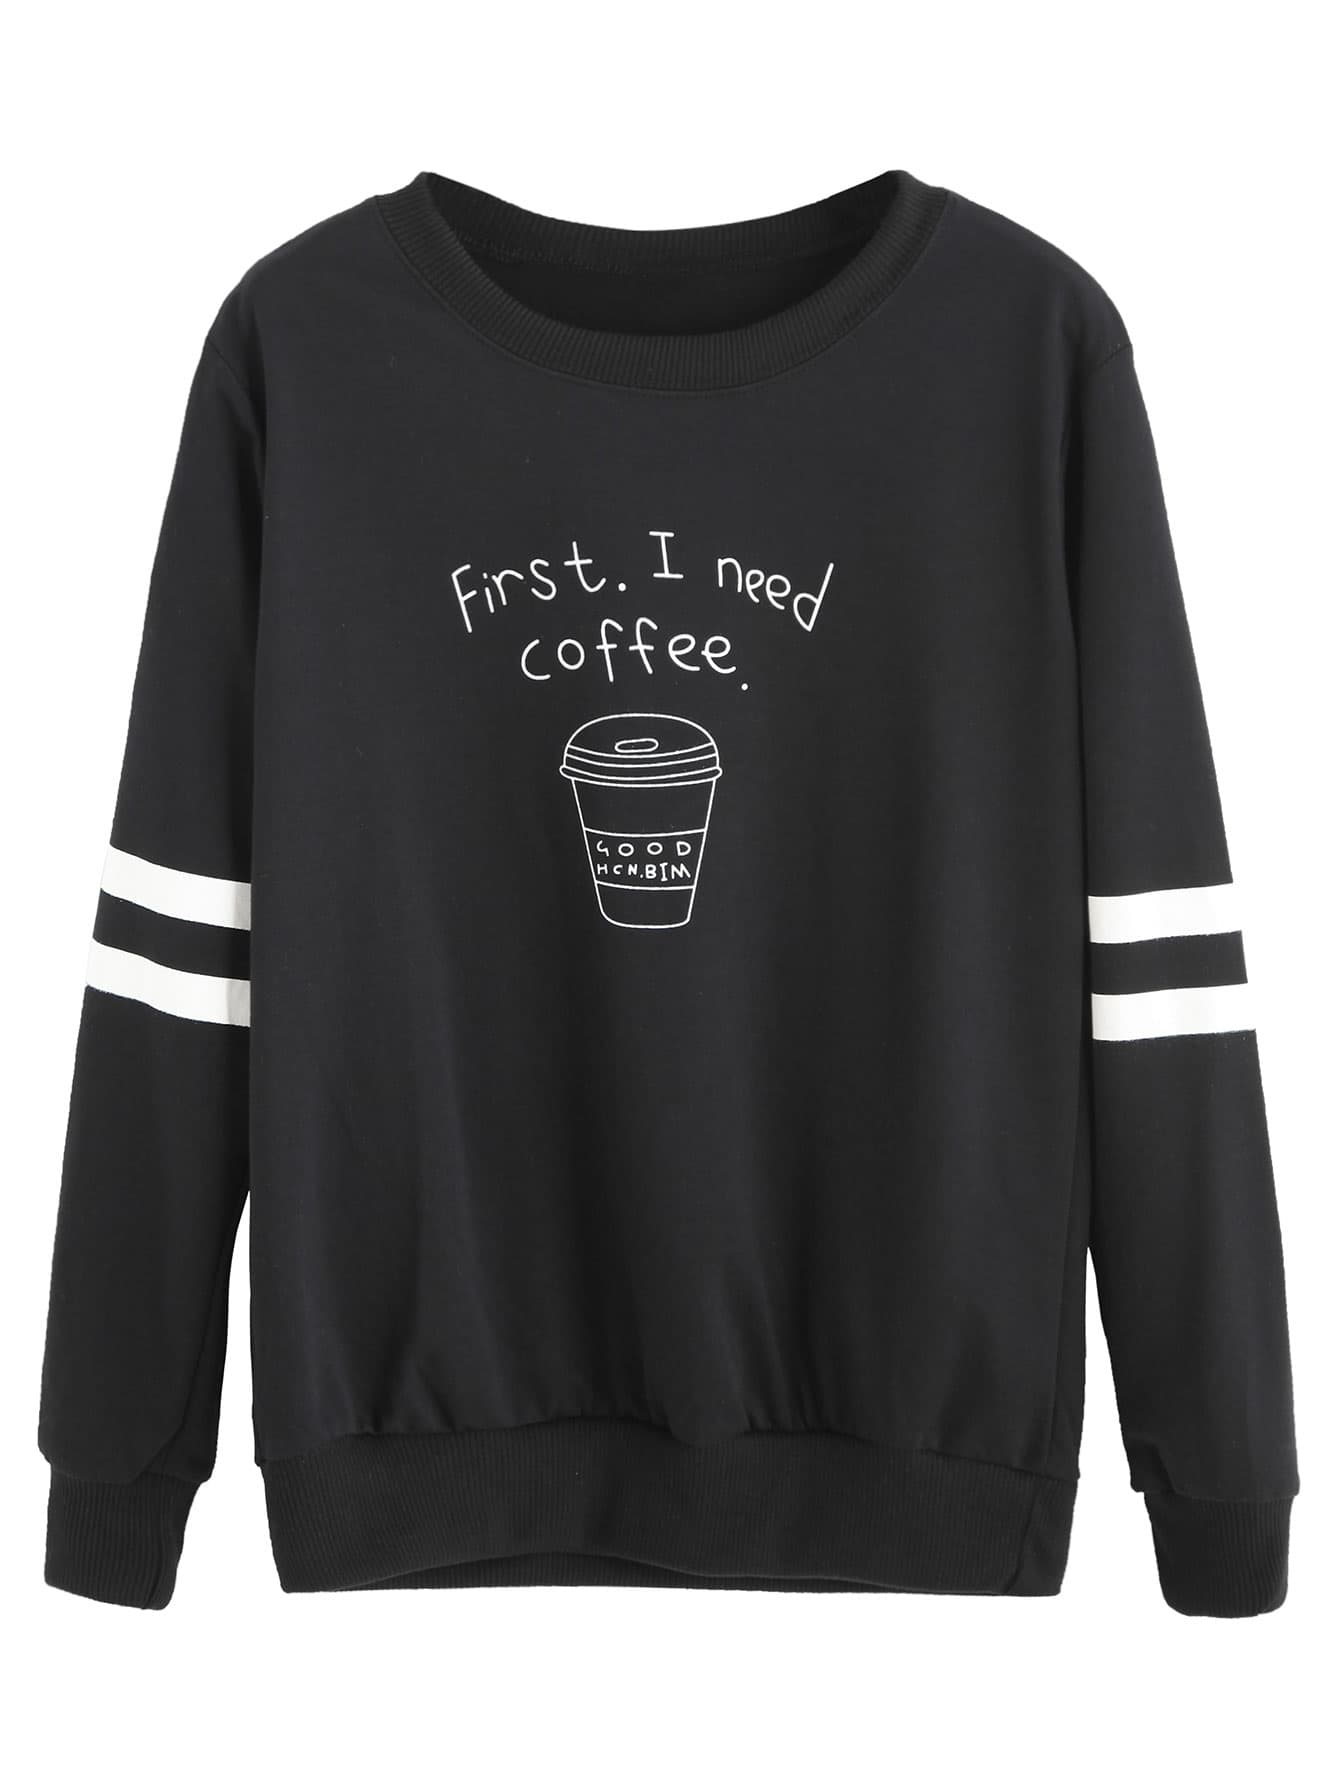 Black Coffee Cup Letters Print Striped Sweatshirt sweatshirt160907126